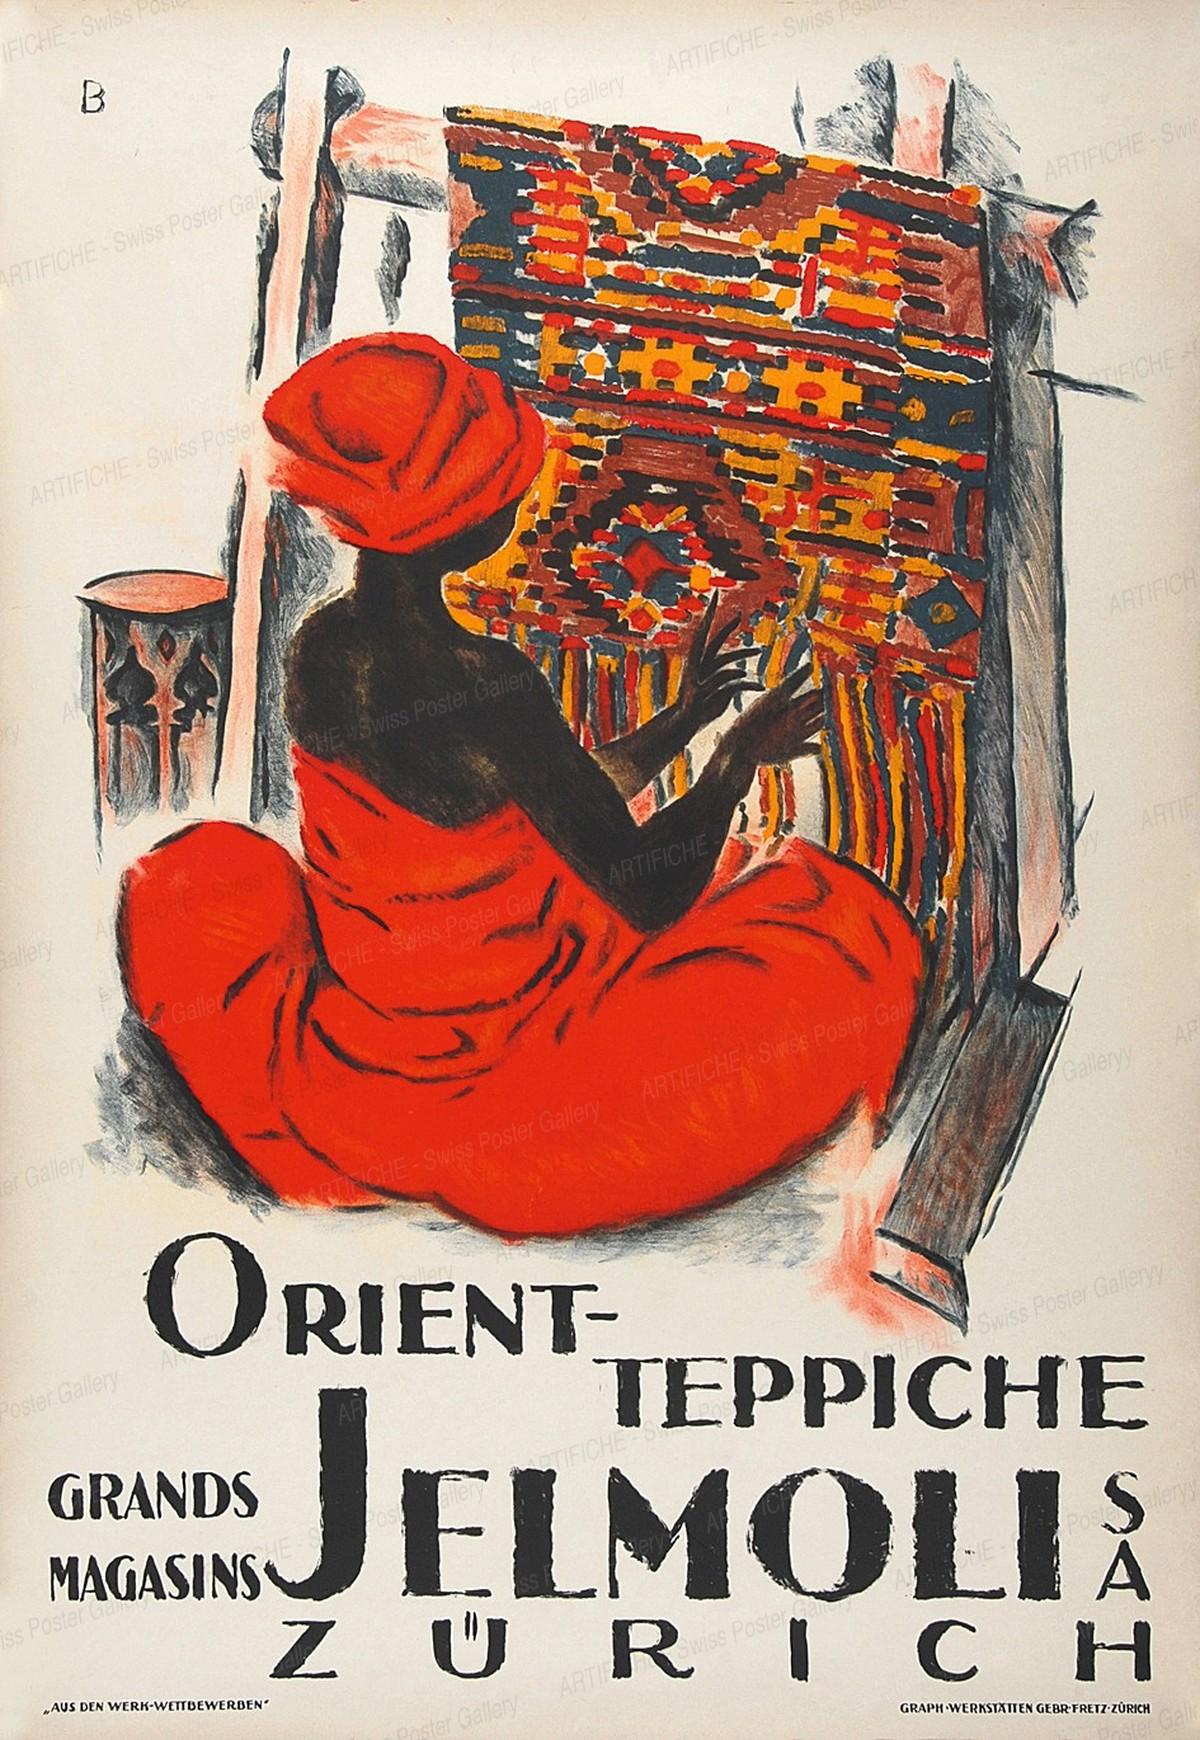 Orient-Teppiche – Grands Magasins Jelmoli SA Zürich, Otto Baumberger